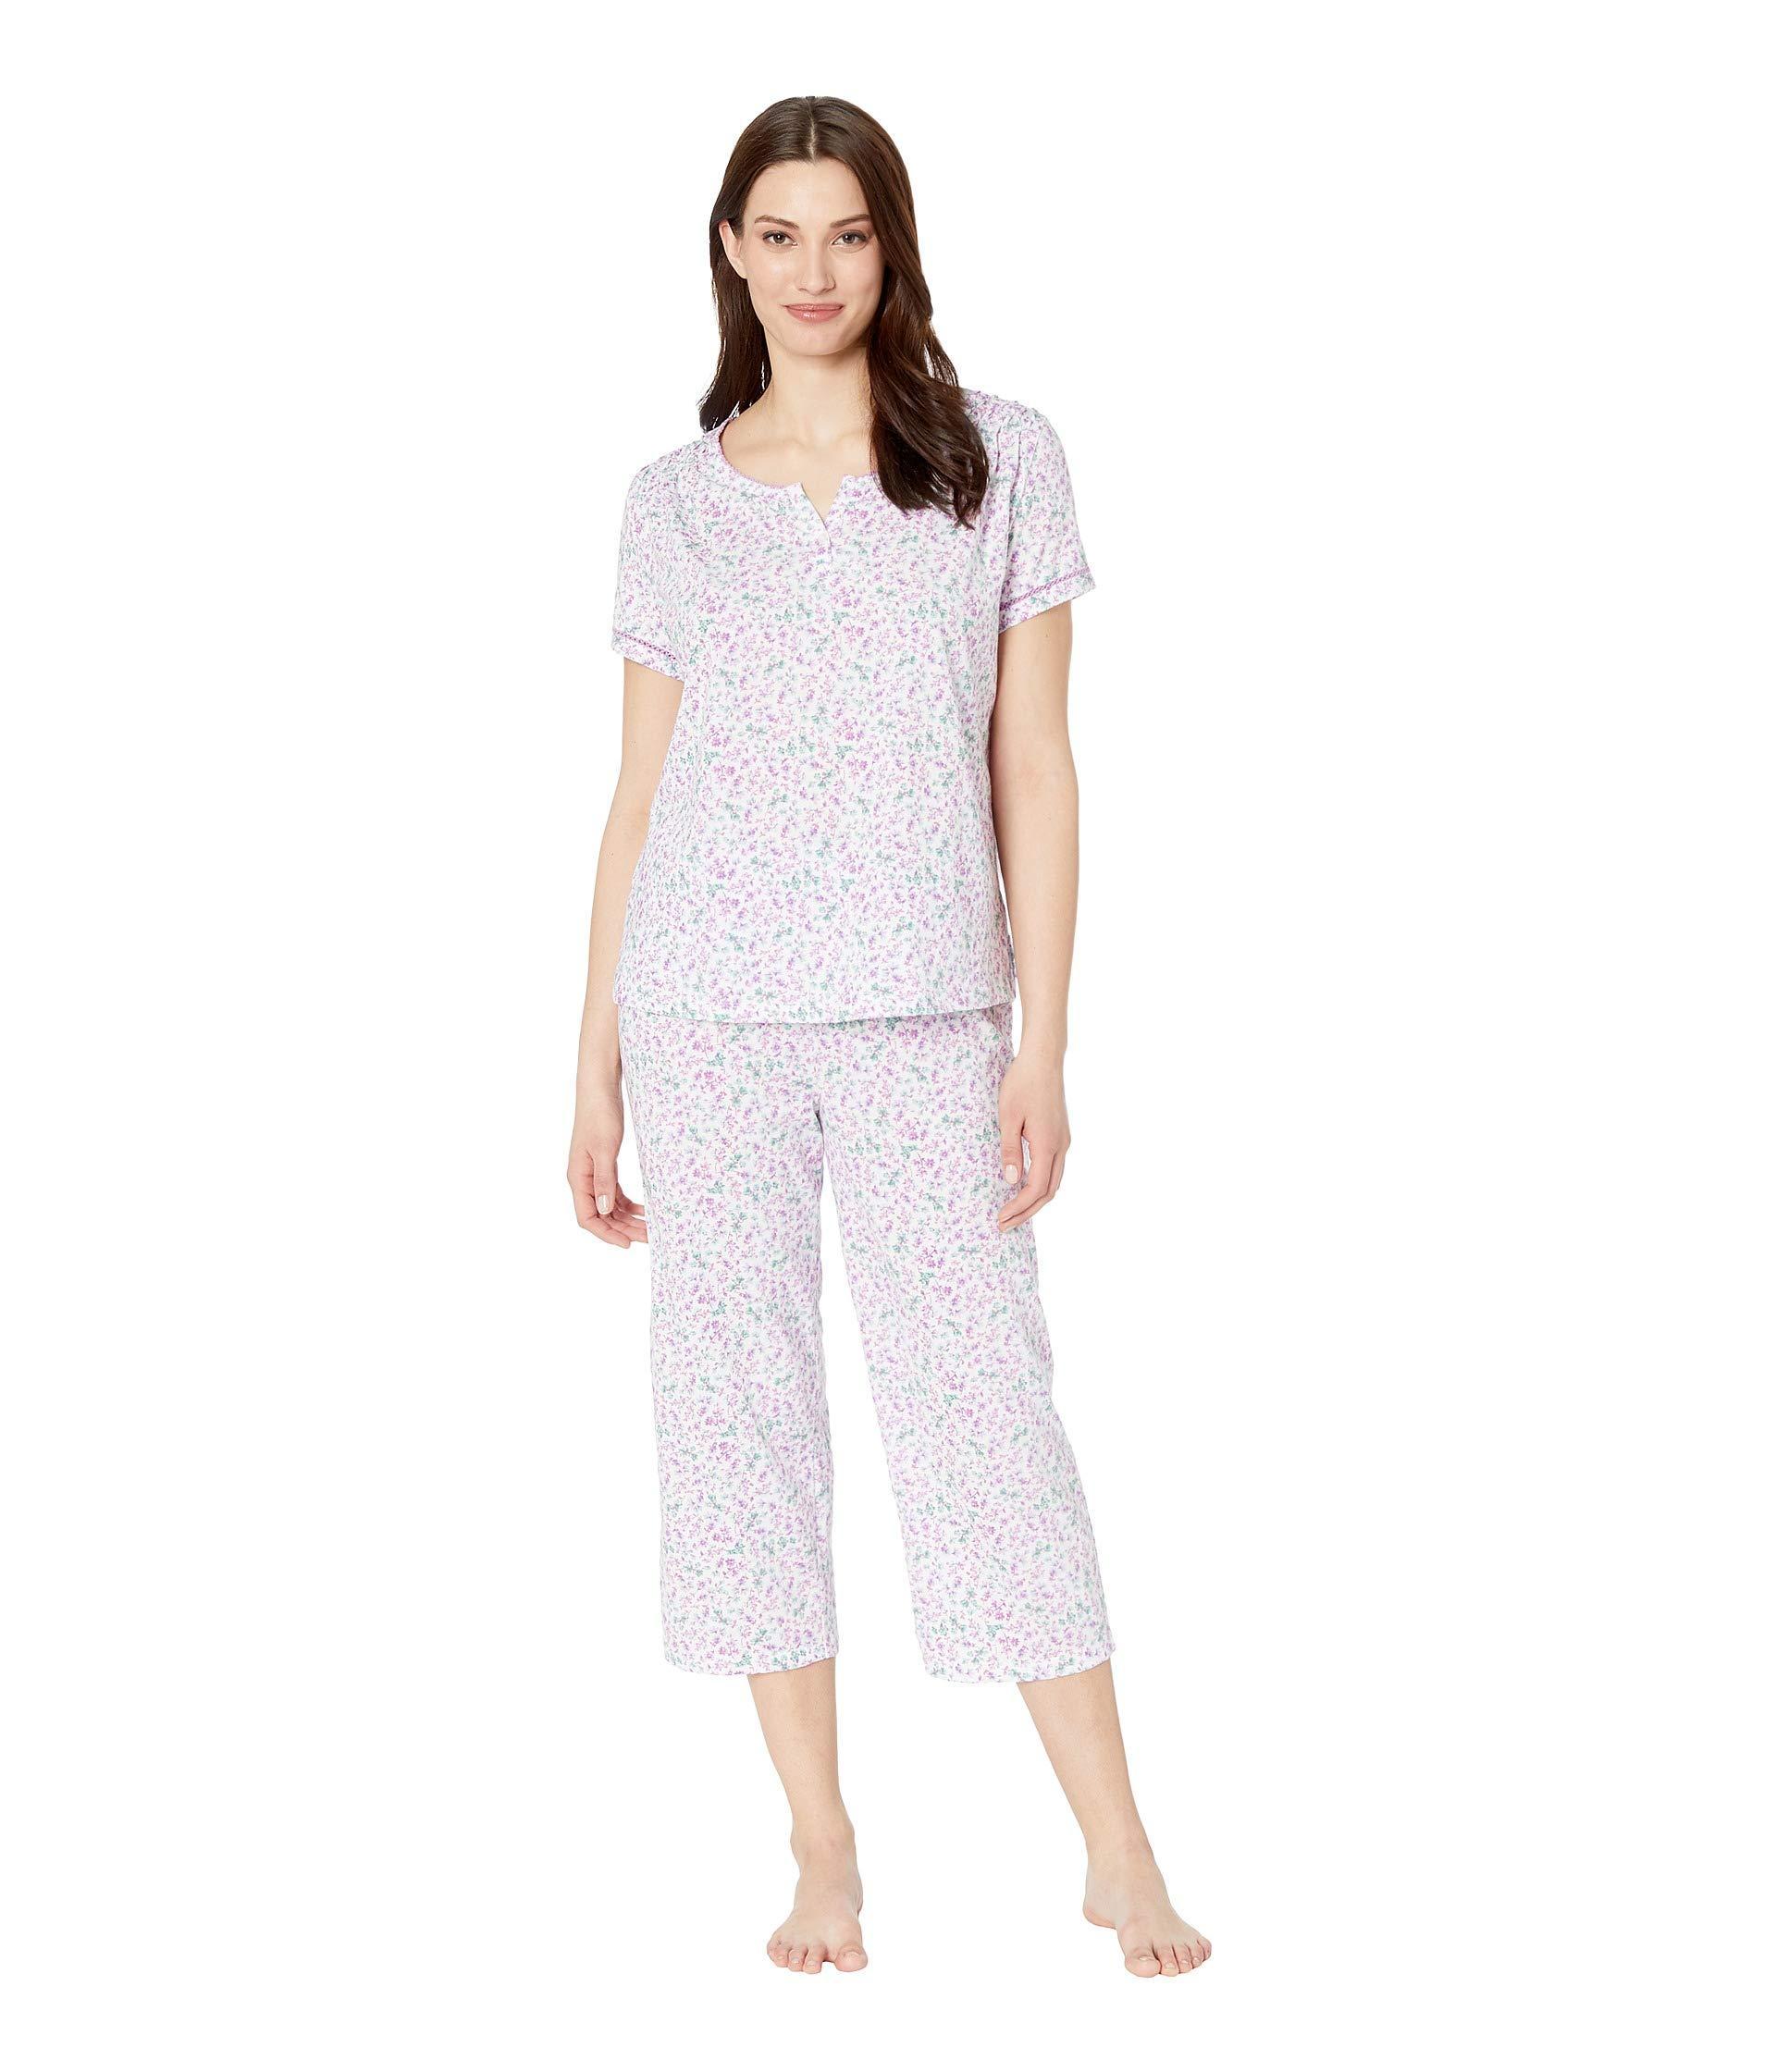 Karen Neuburger. Cloud Nine Short Sleeve Henley Capris Pj (ditsy purple) Women s  Pajama Sets e63d77f79